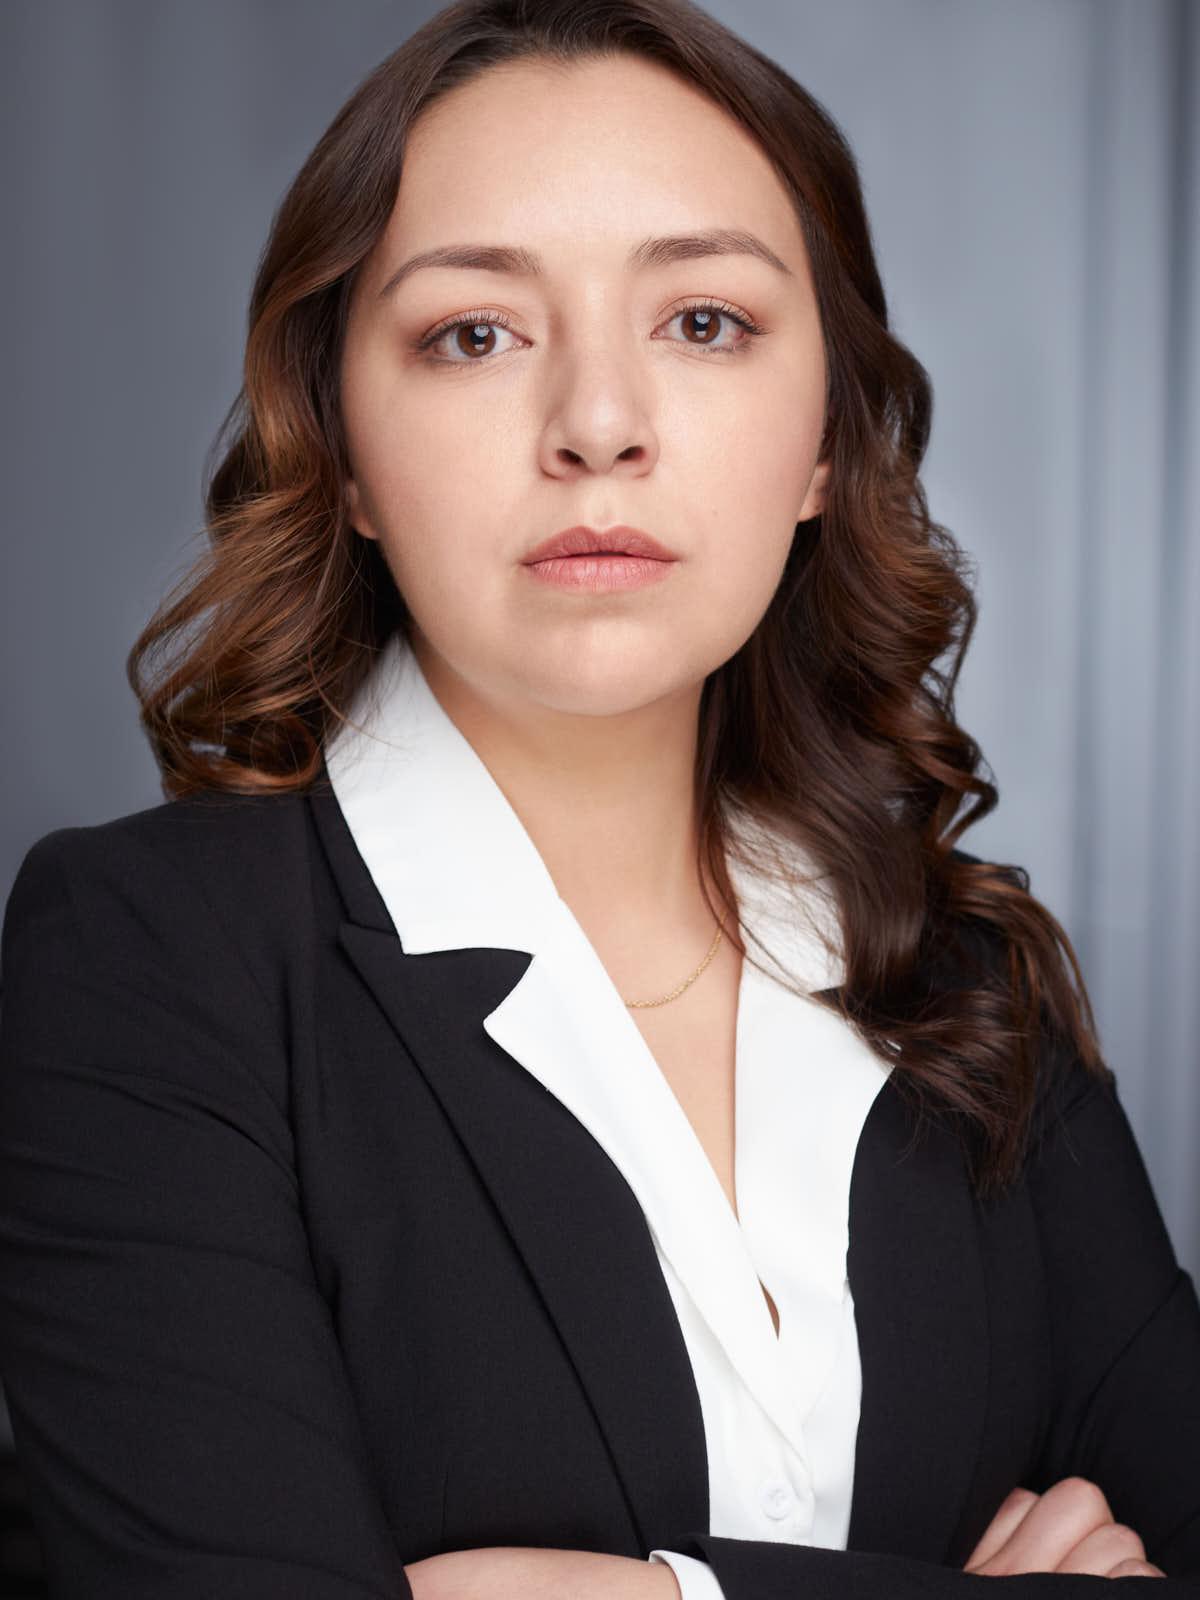 sce-agency-female-actor-josefina-e-1aaaa